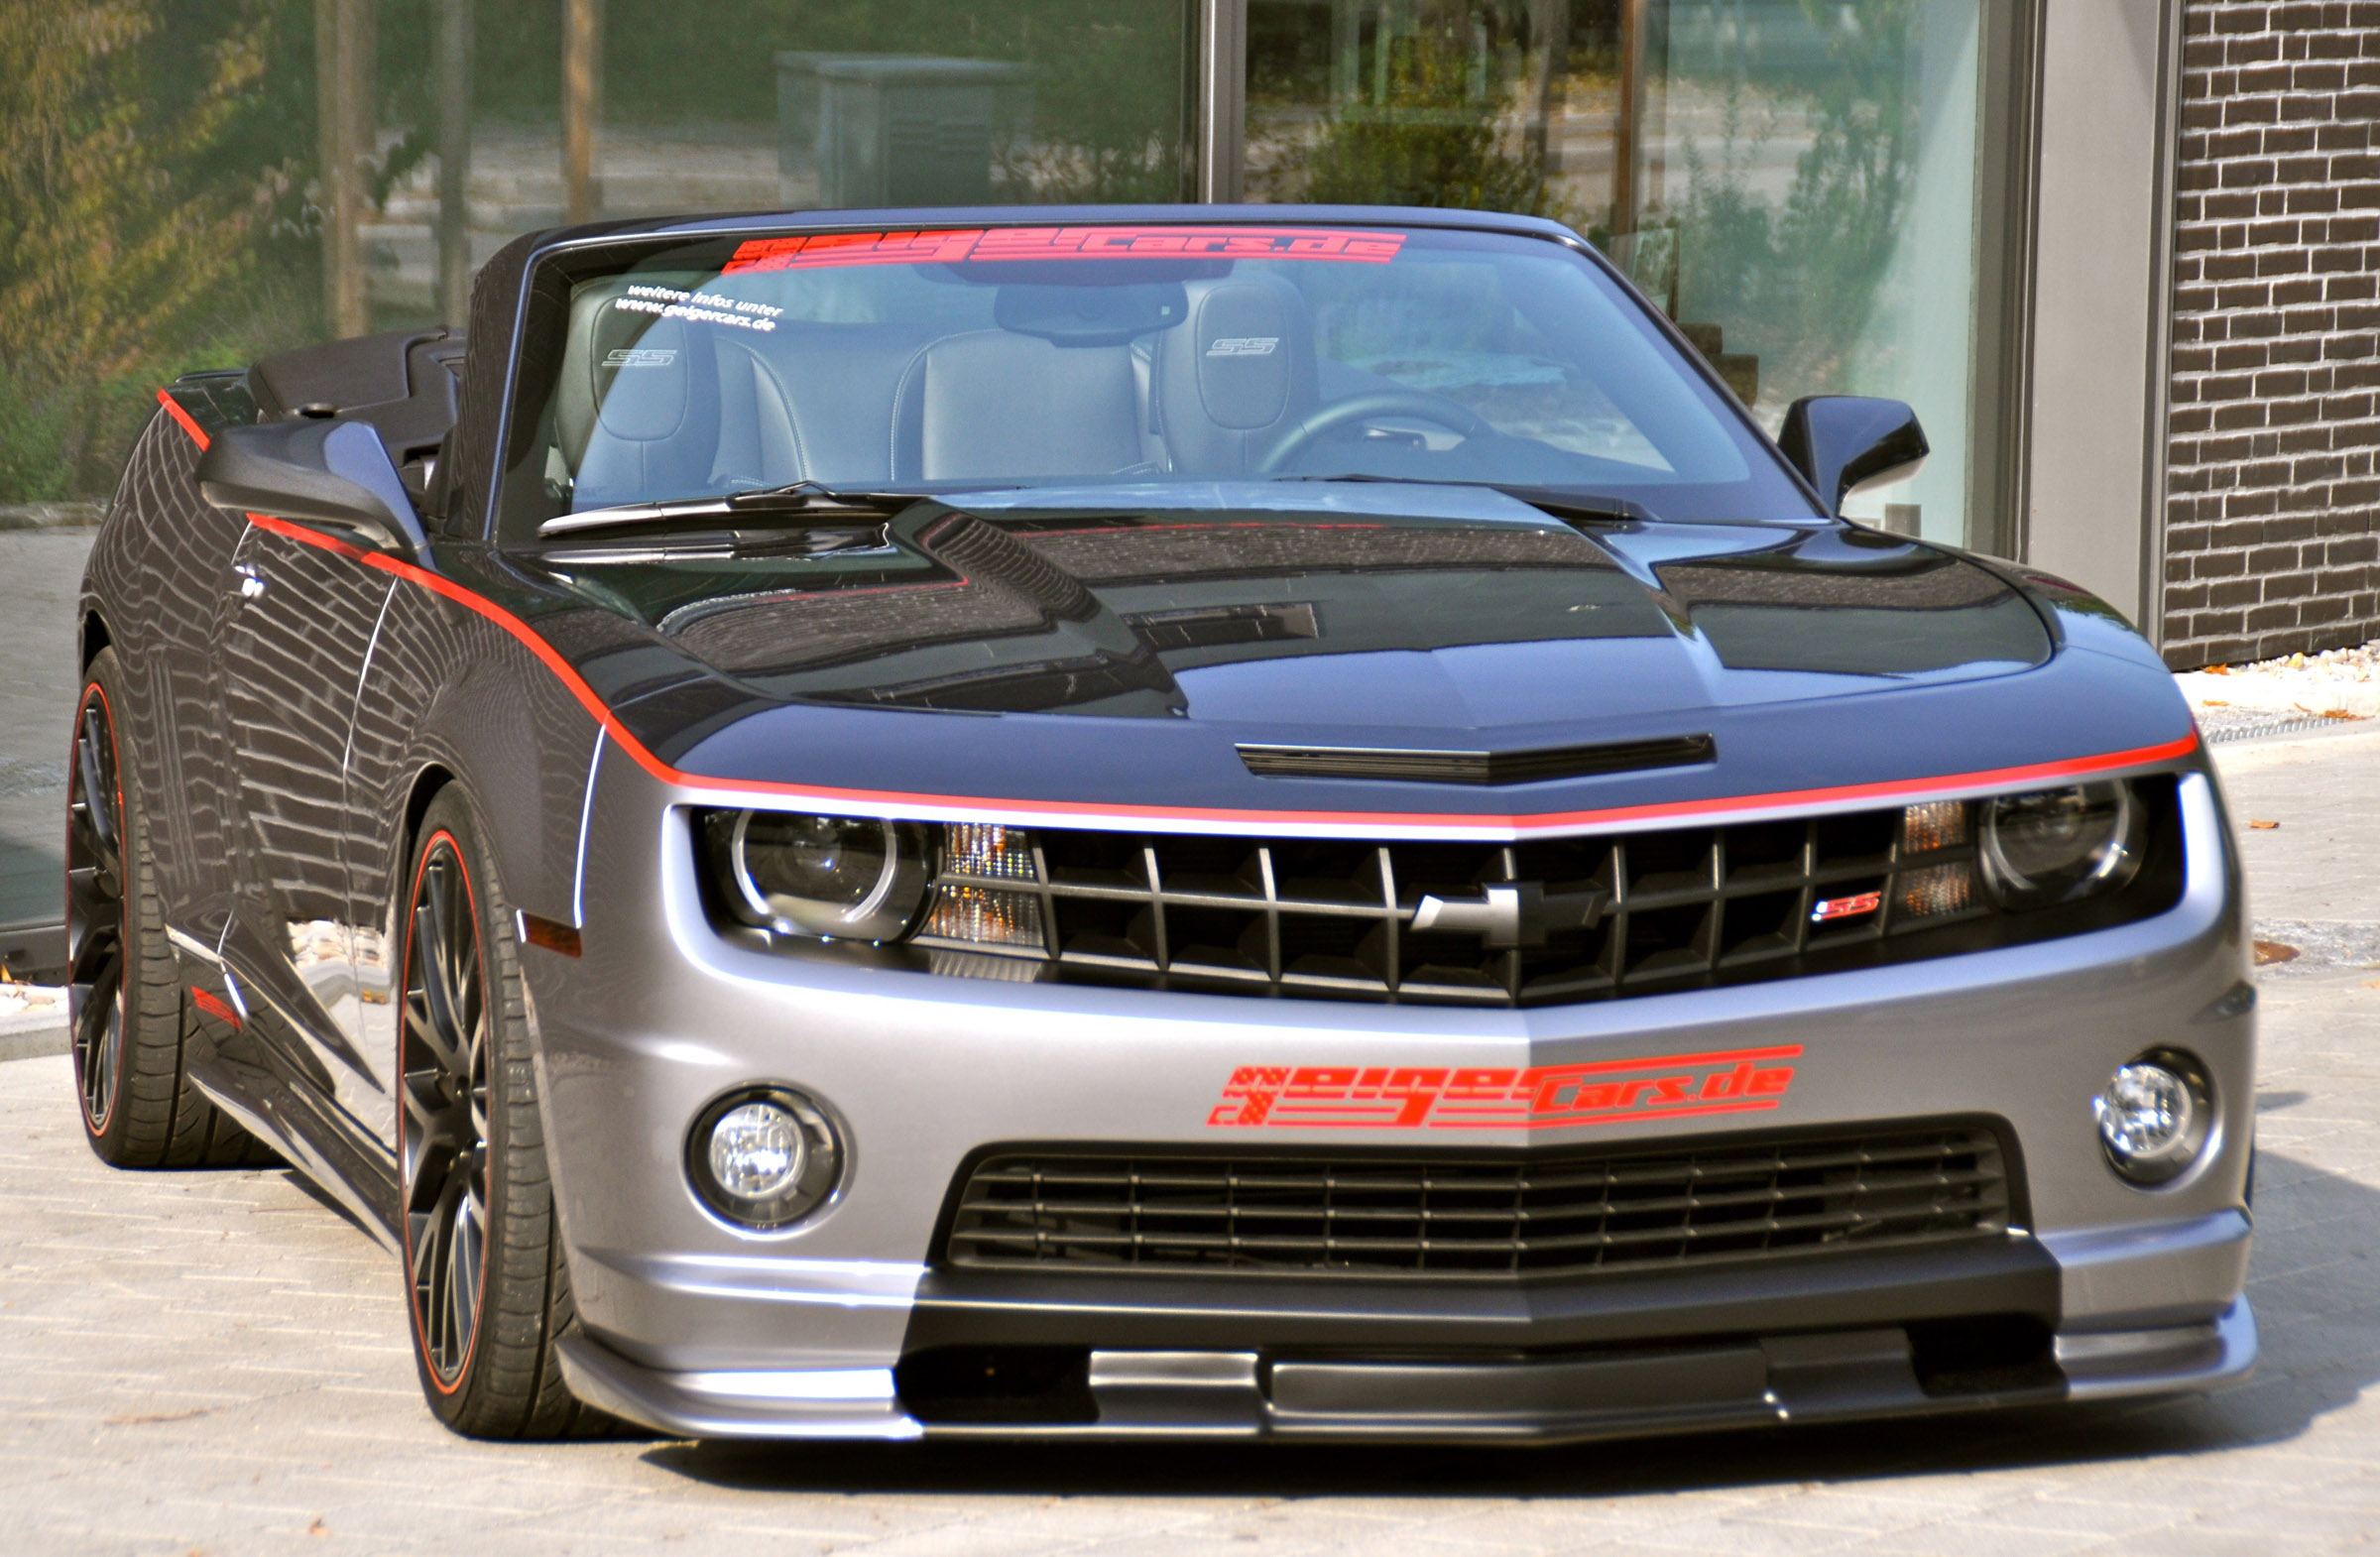 2012 chevrolet camaro 2ss convertible geiger compressor. Black Bedroom Furniture Sets. Home Design Ideas